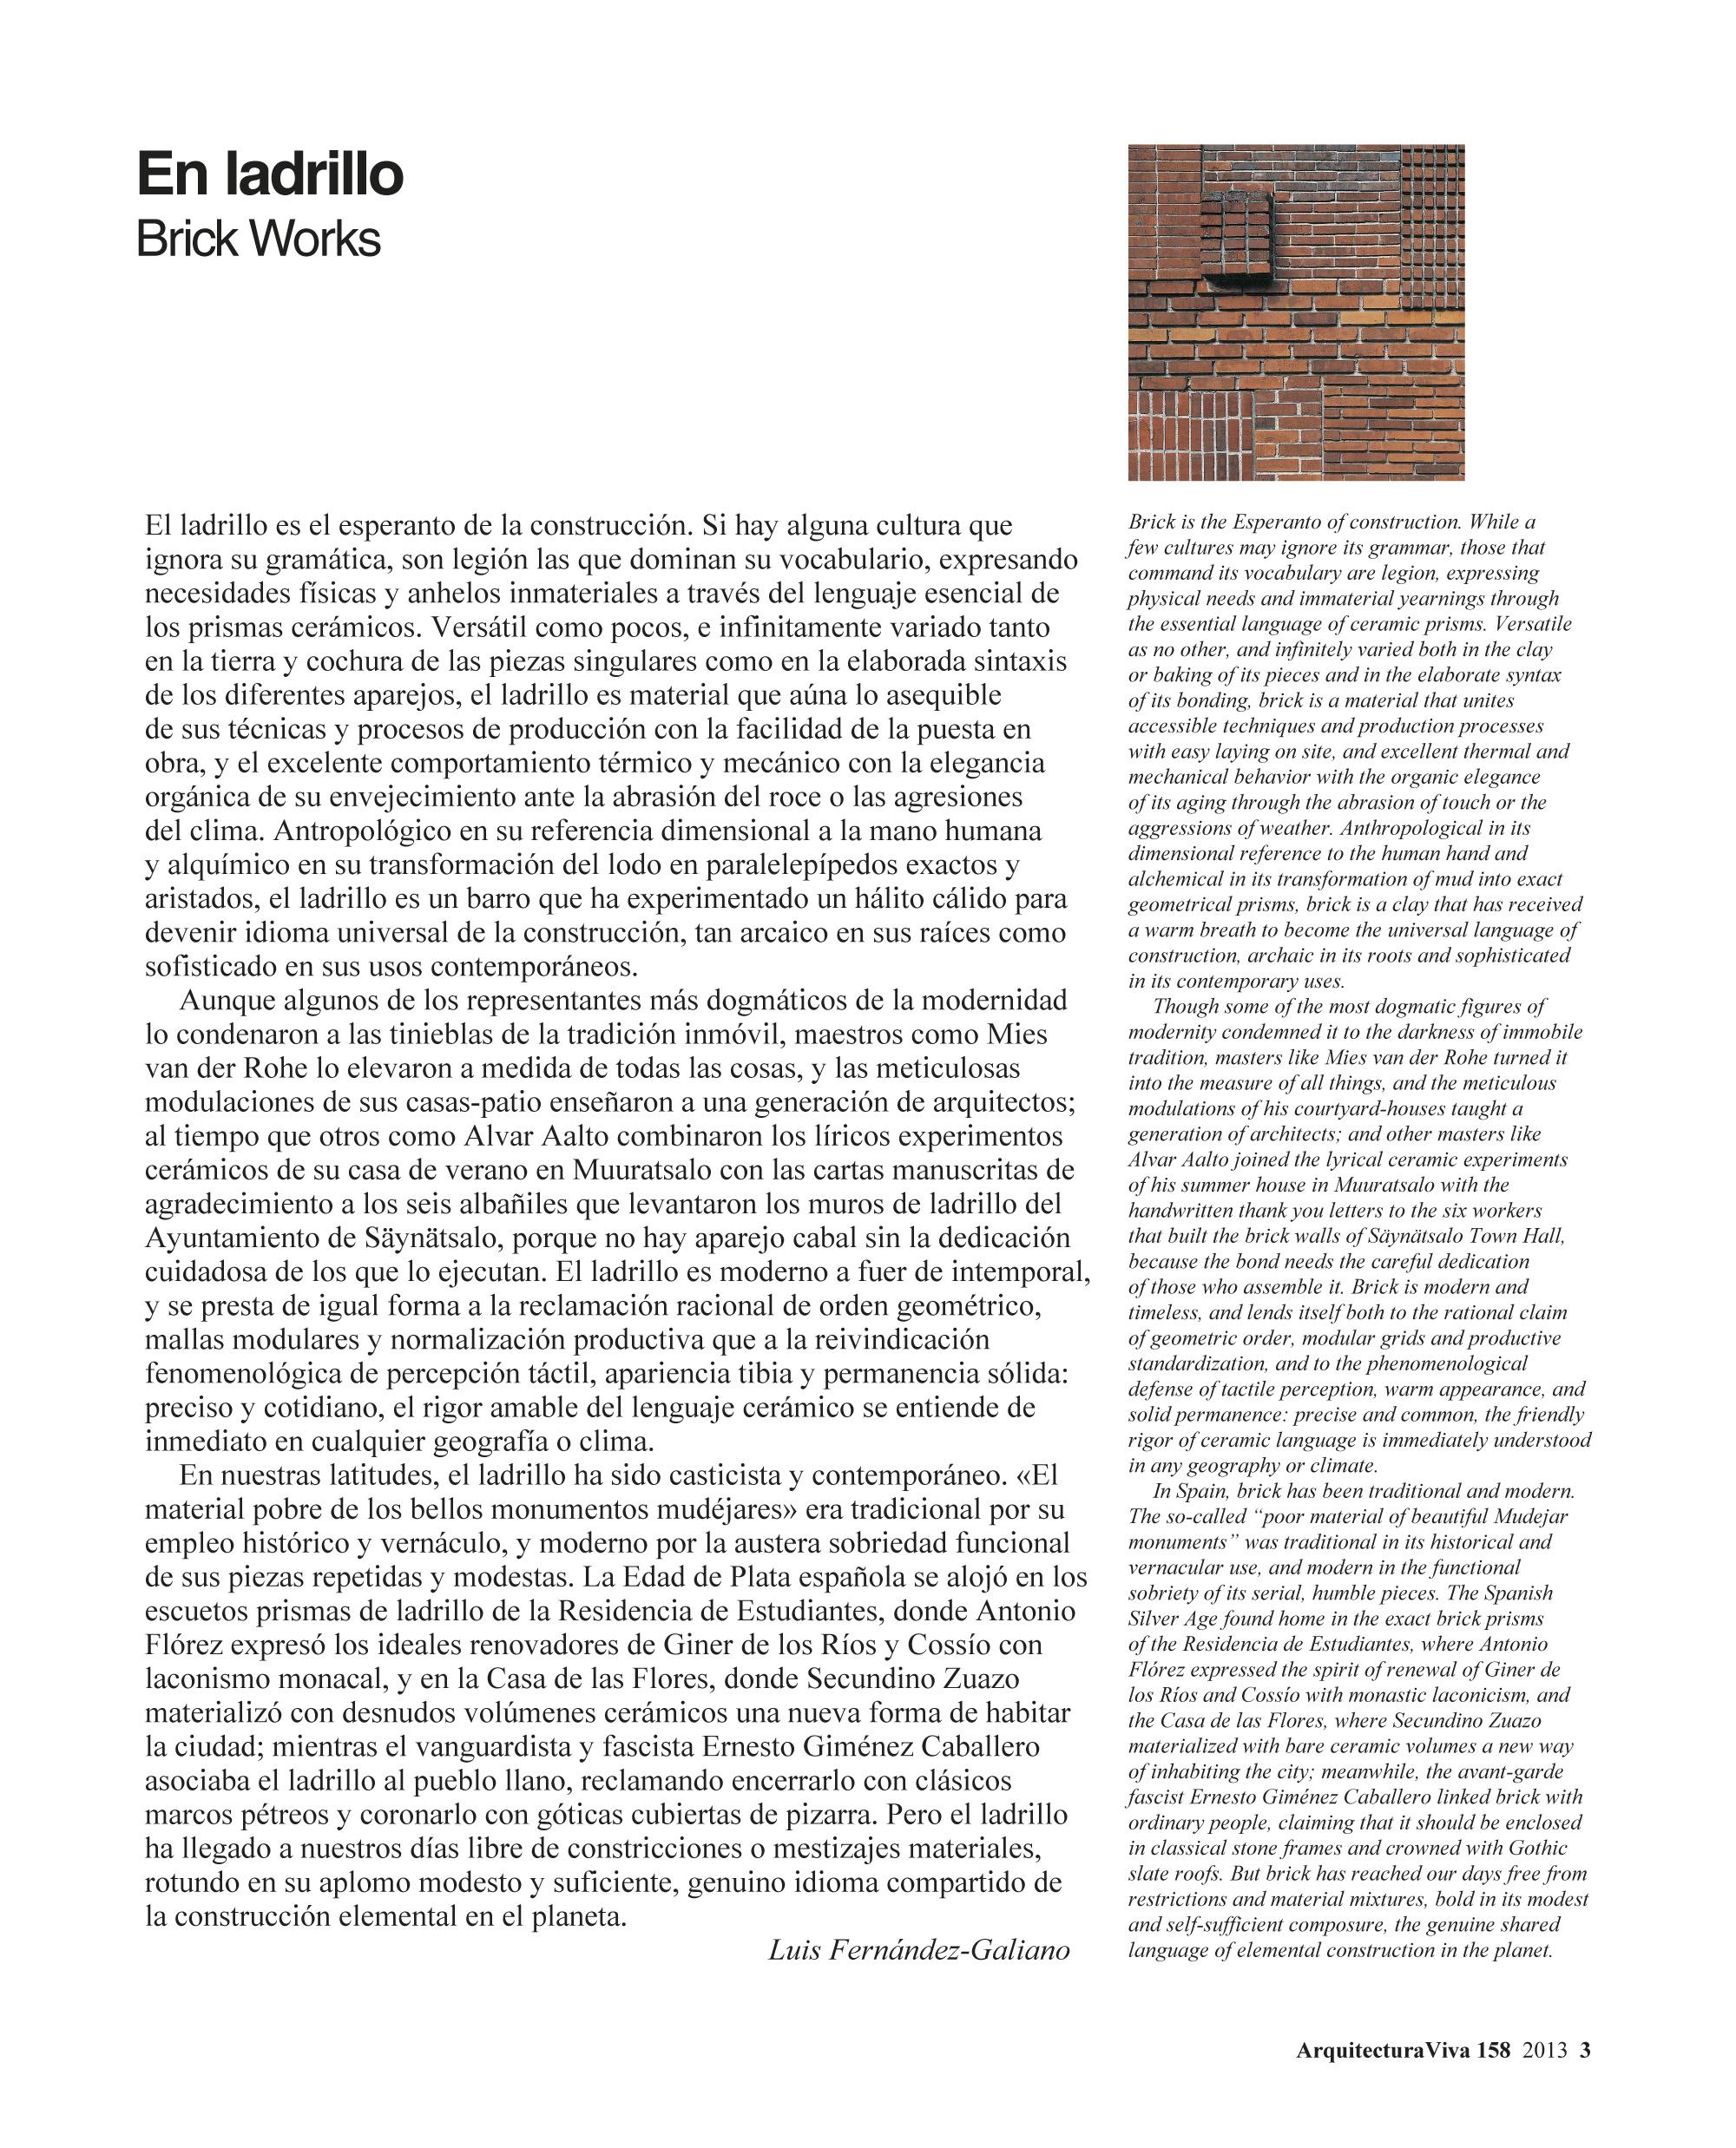 Brick Works